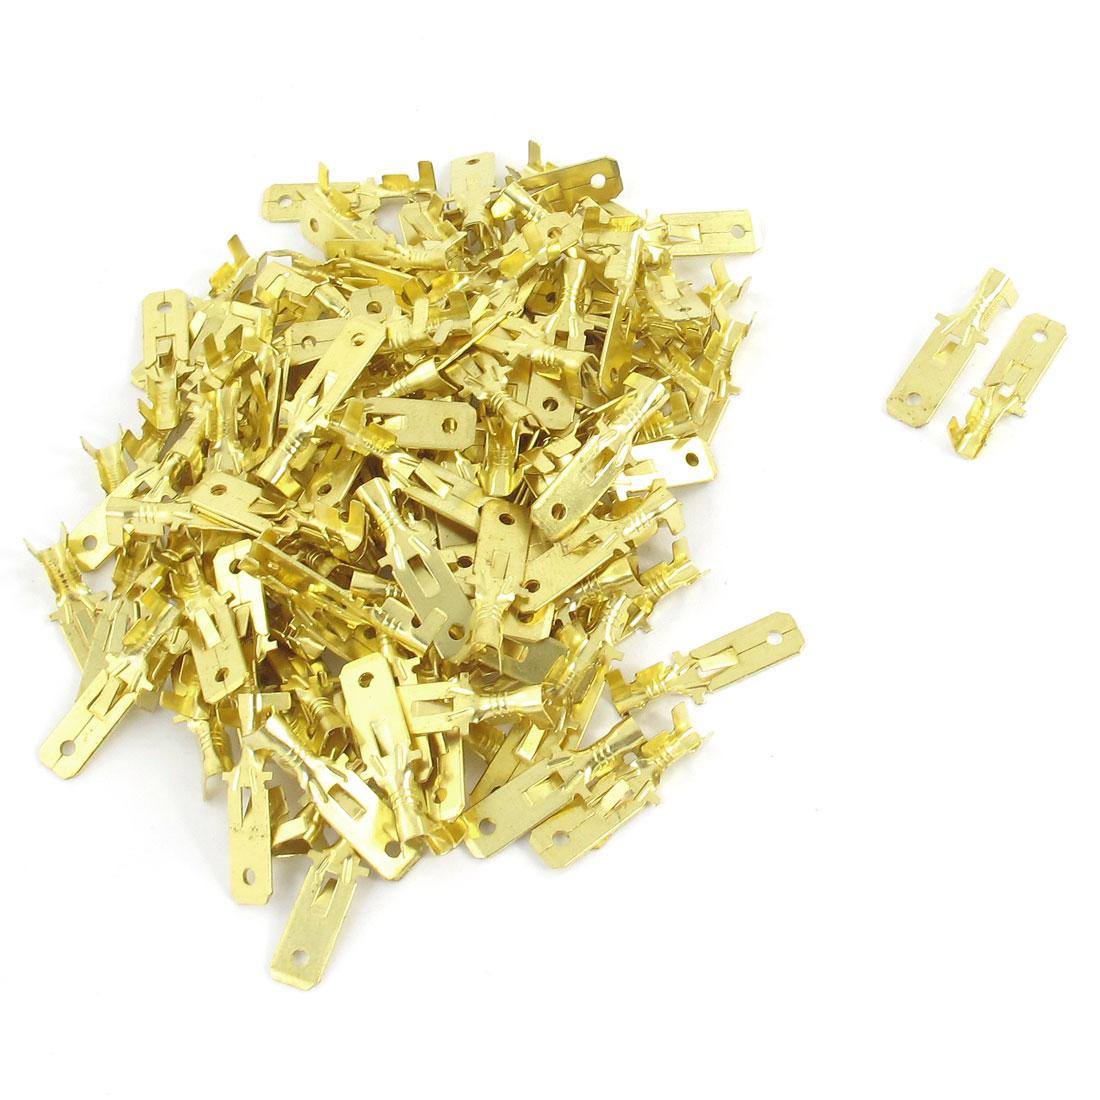 100 Pcs Gold Tone Metal Male Spade Crimp Terminal Connectors